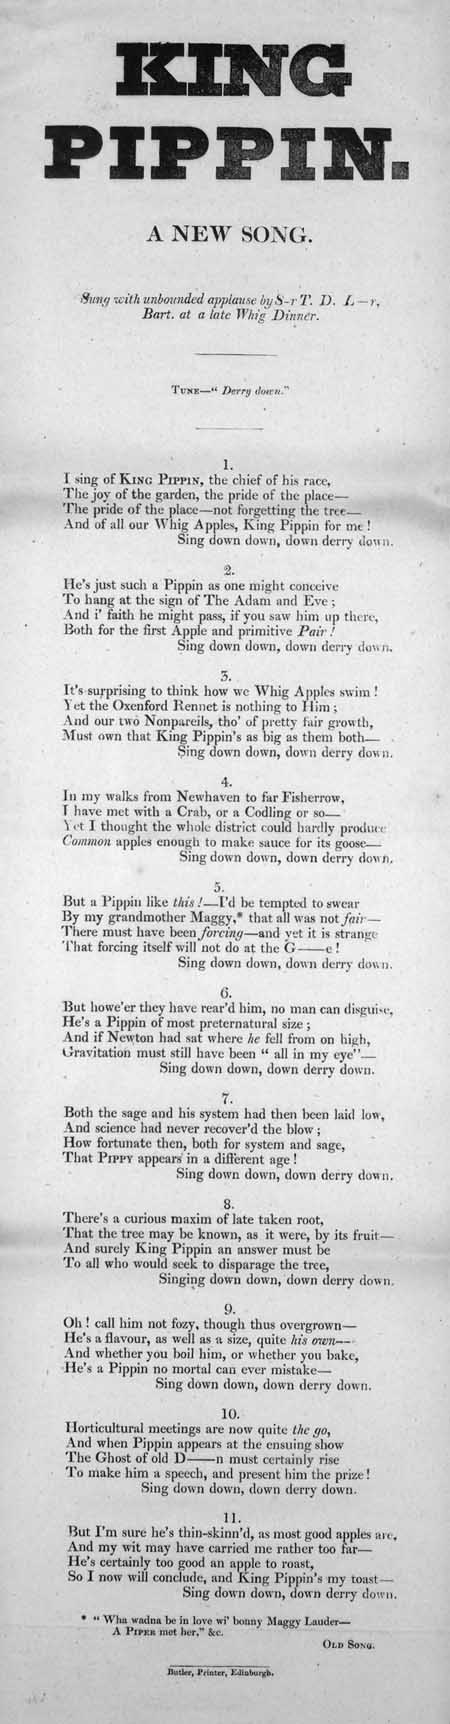 Broadside ballad entitled 'King Pippin'